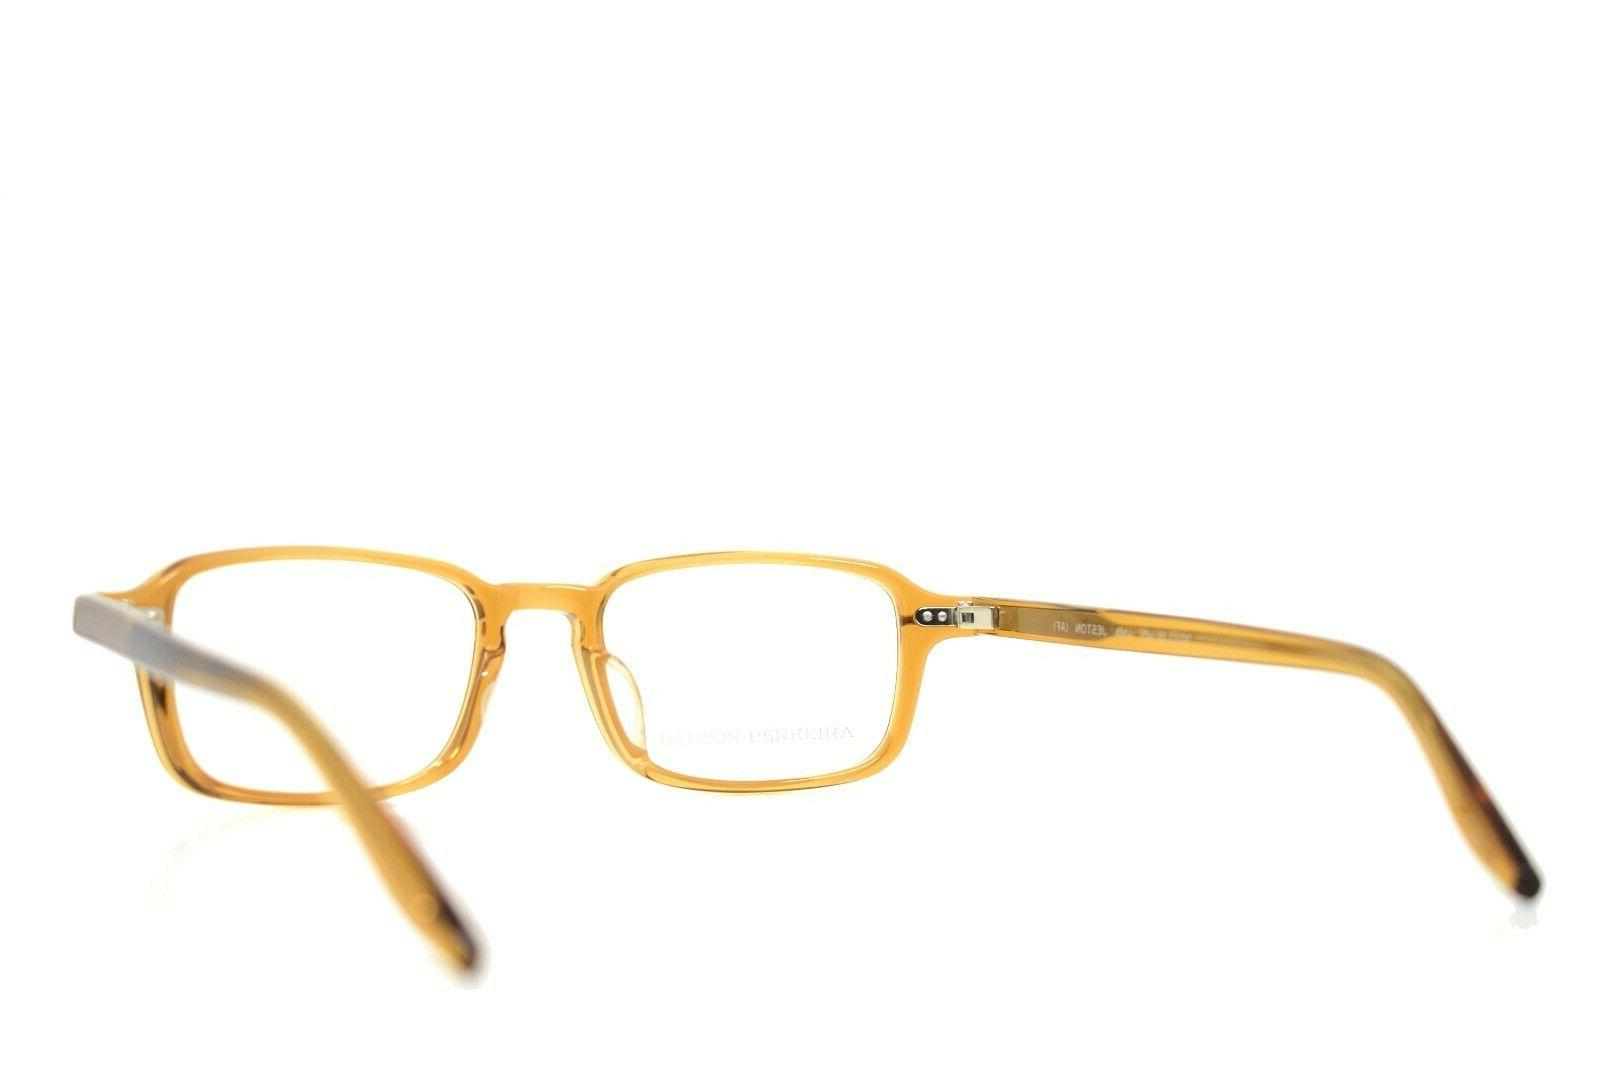 Barton Perreira Prescription eyeglasses Asian Fit AMA 50-19-145 Japan